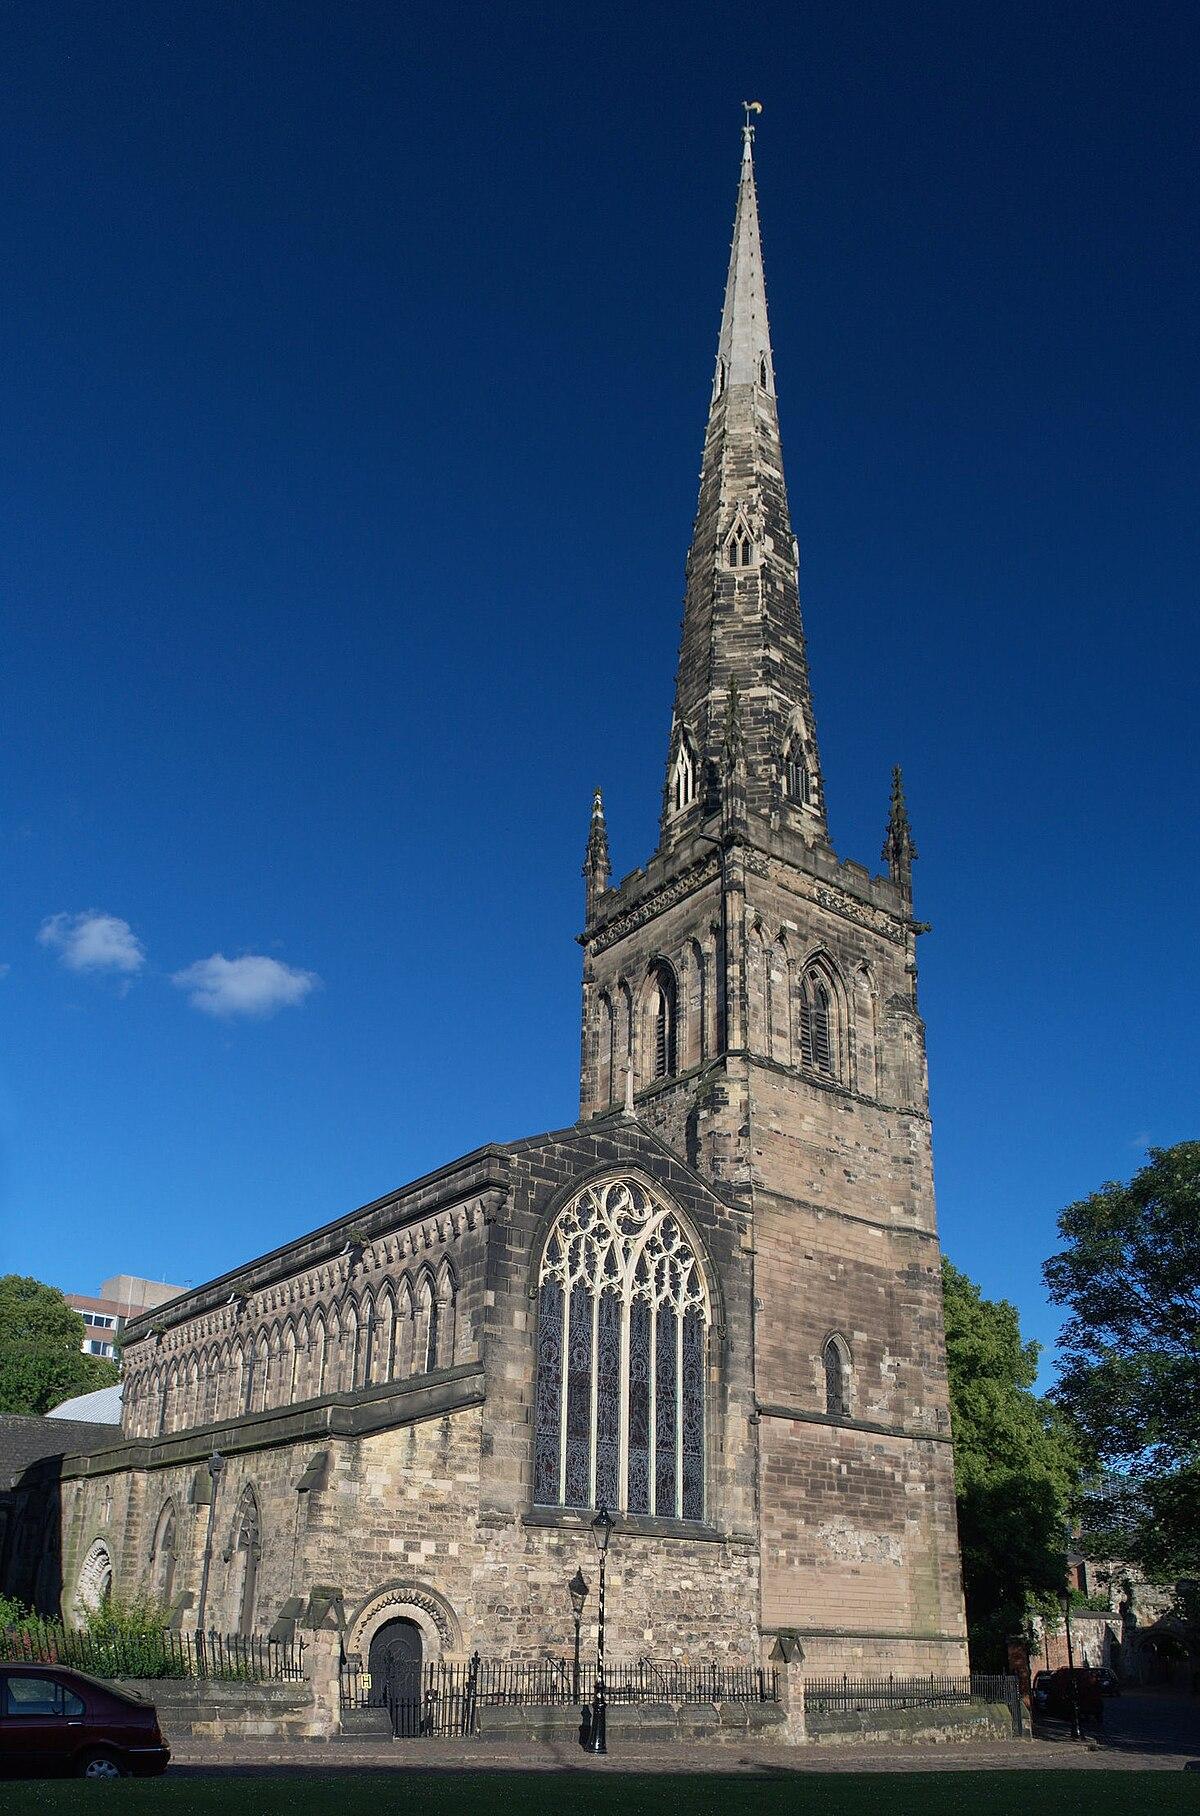 Church of St Mary de Castro, Leicester - Wikipedia